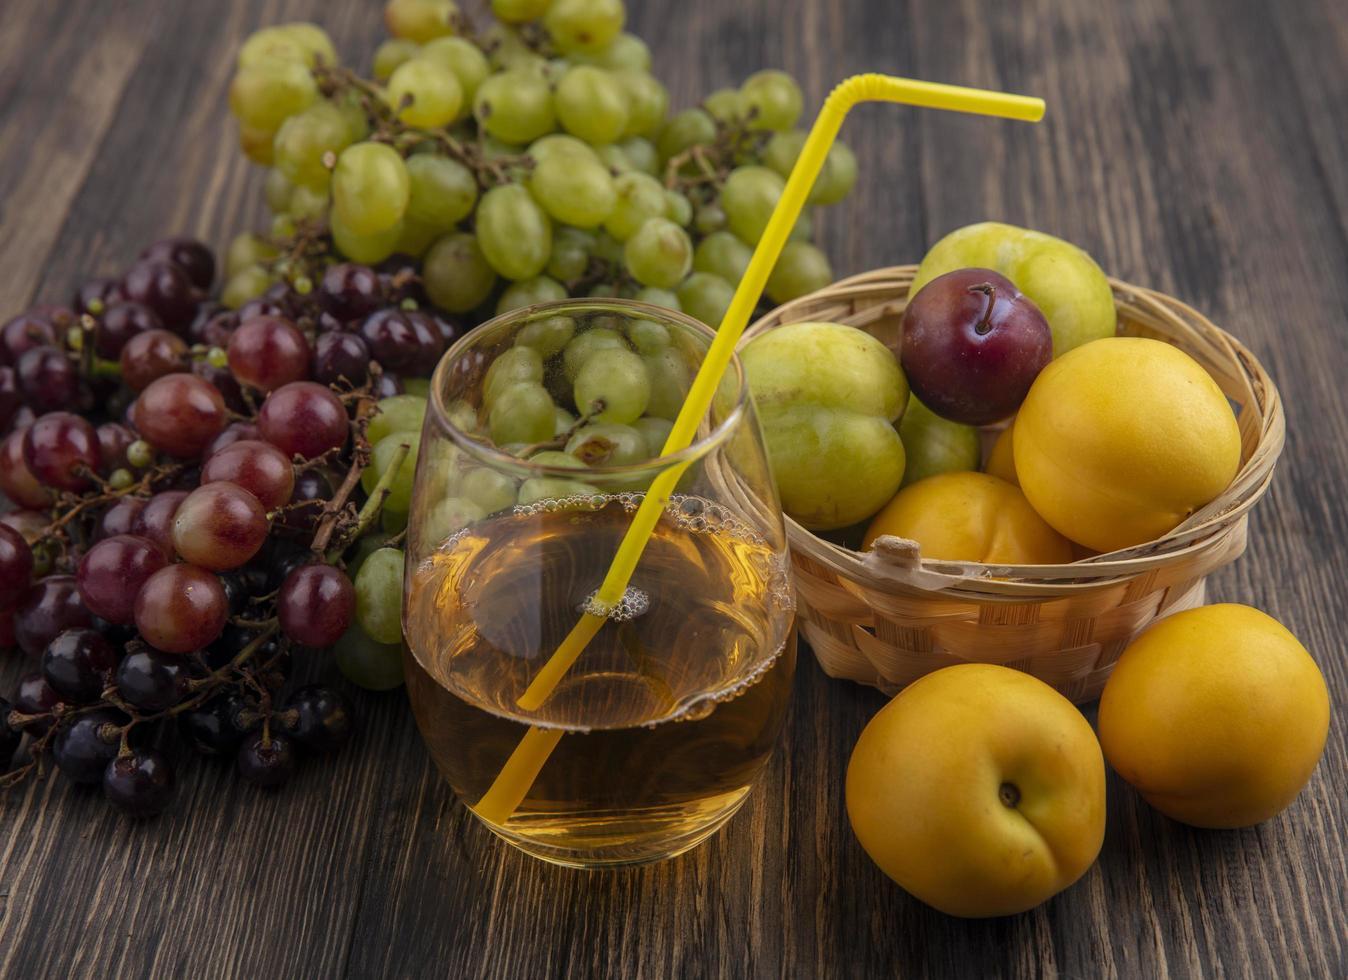 jugo de uva con frutas sobre fondo de madera foto